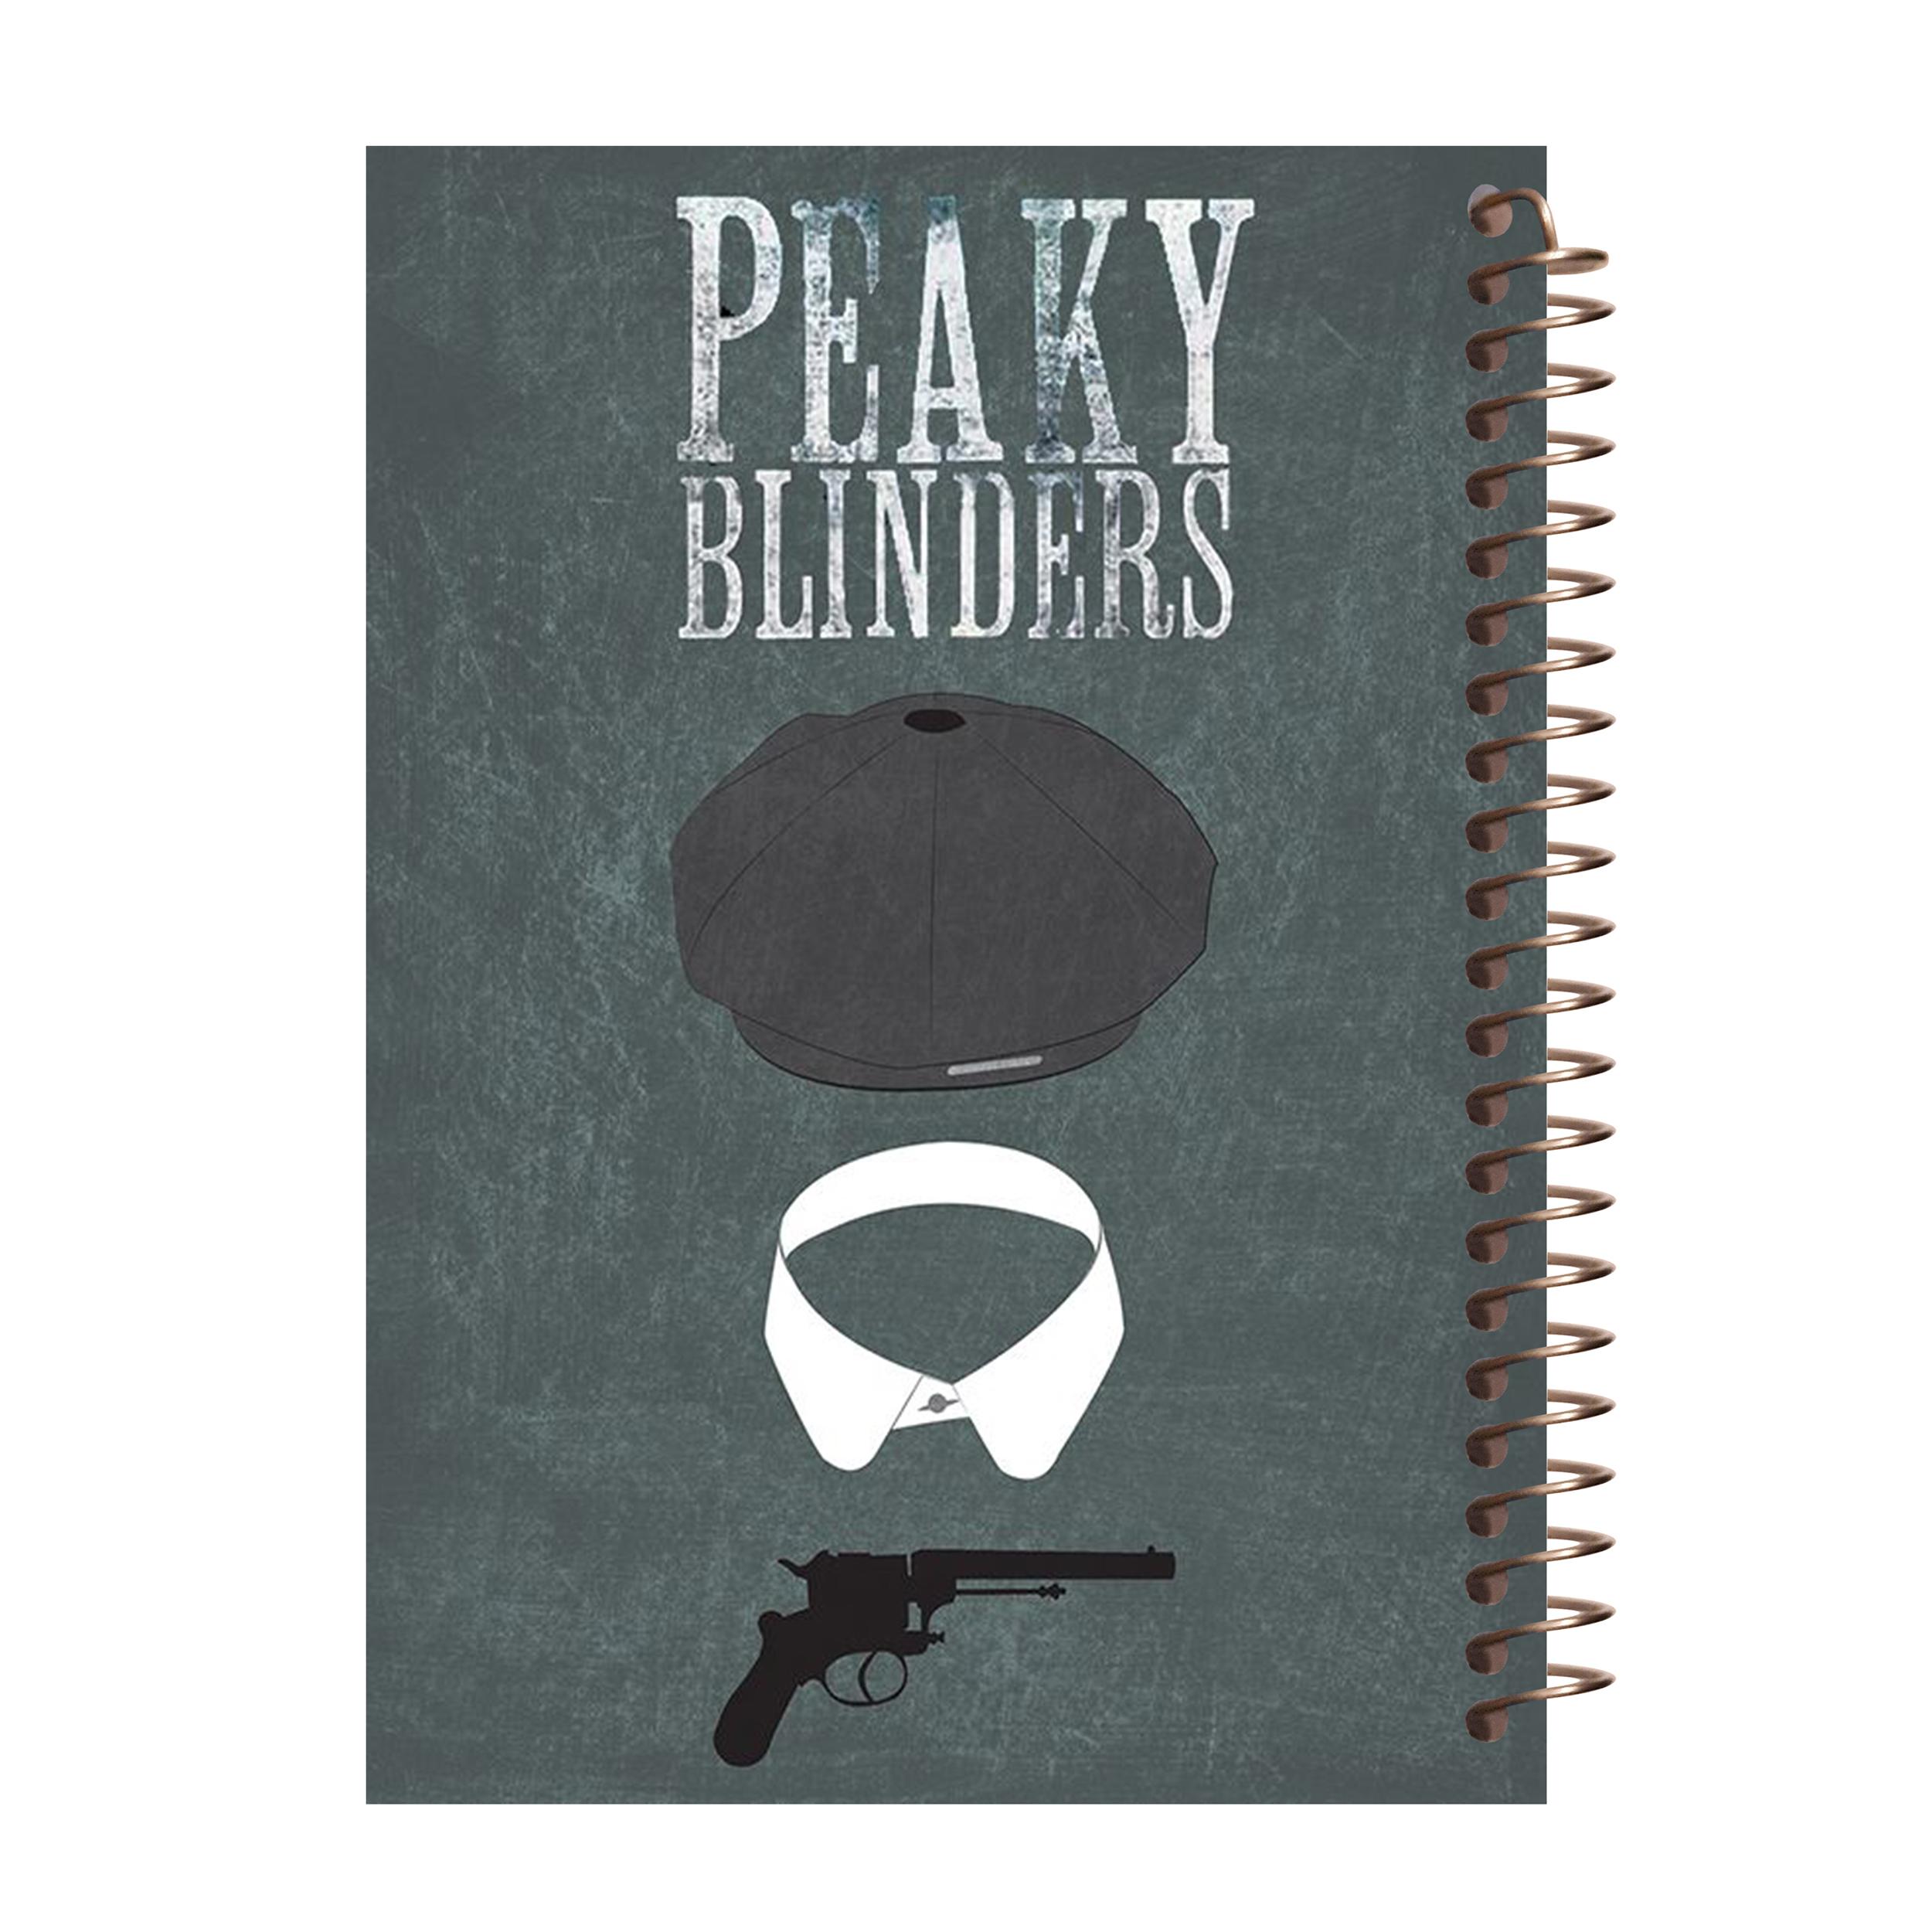 دفتر یادداشت آف تاب مدل Peaky Blinders کد 05